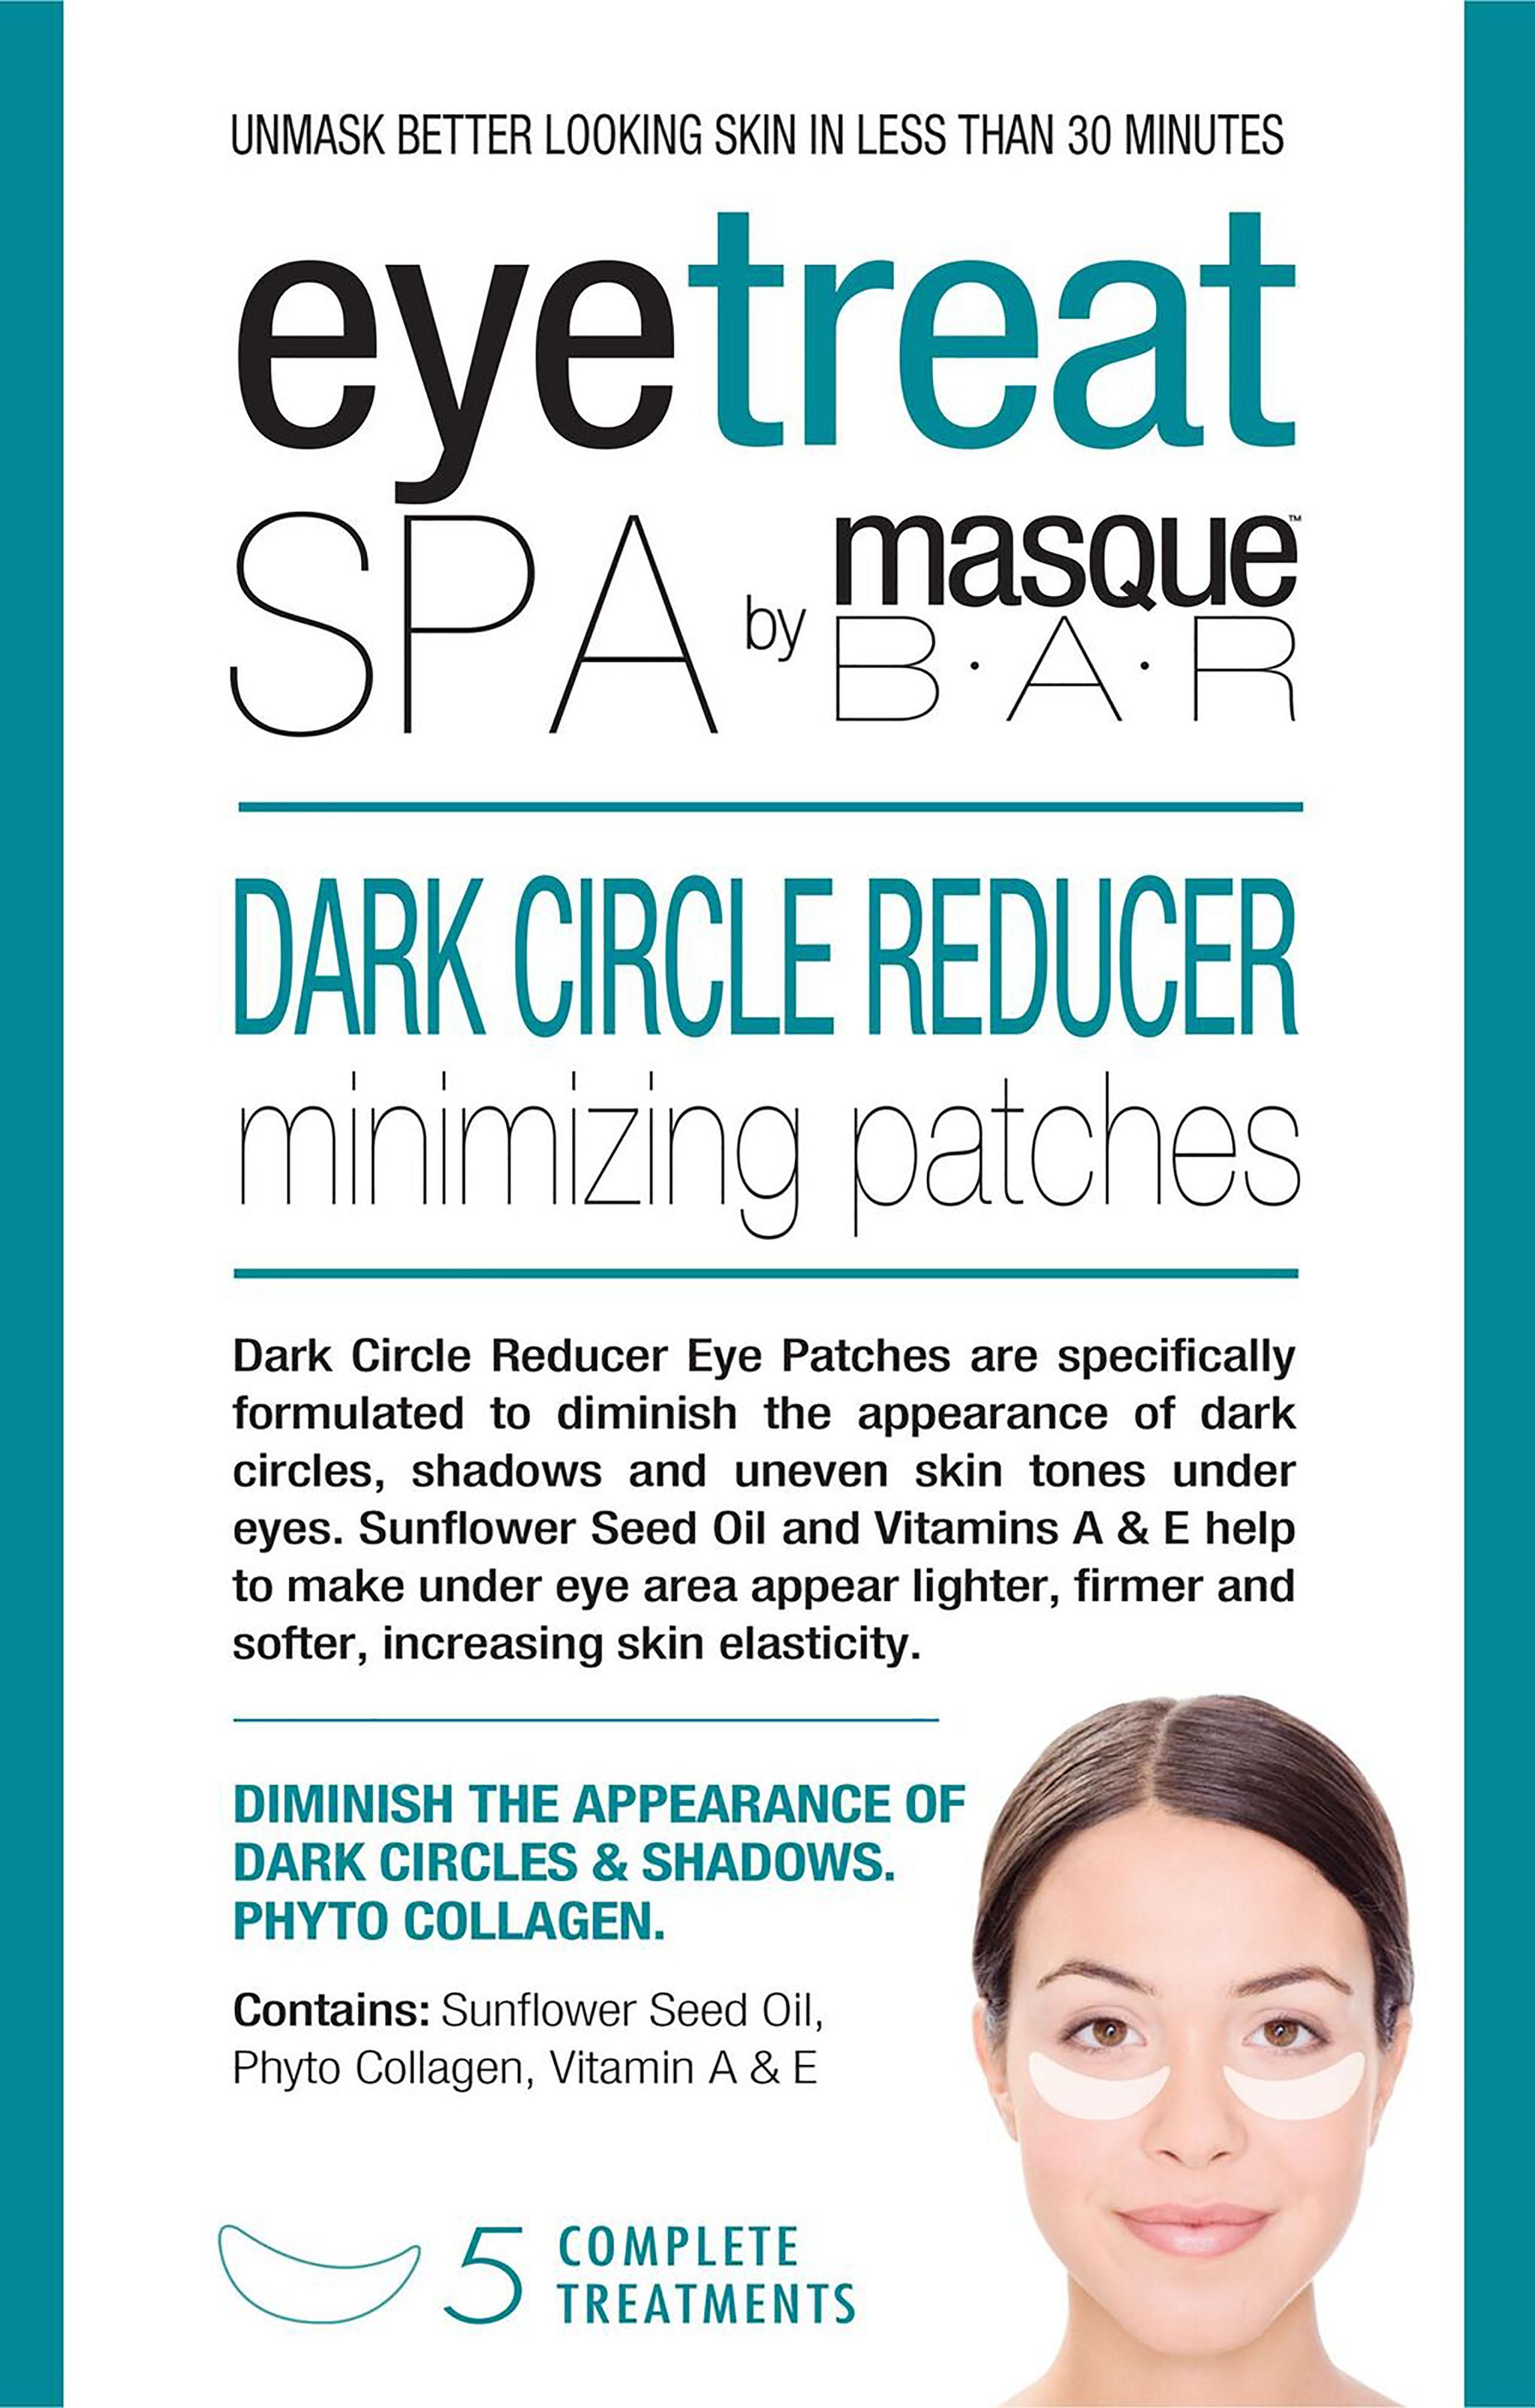 Dark Circle Reducer Minimizing Patches